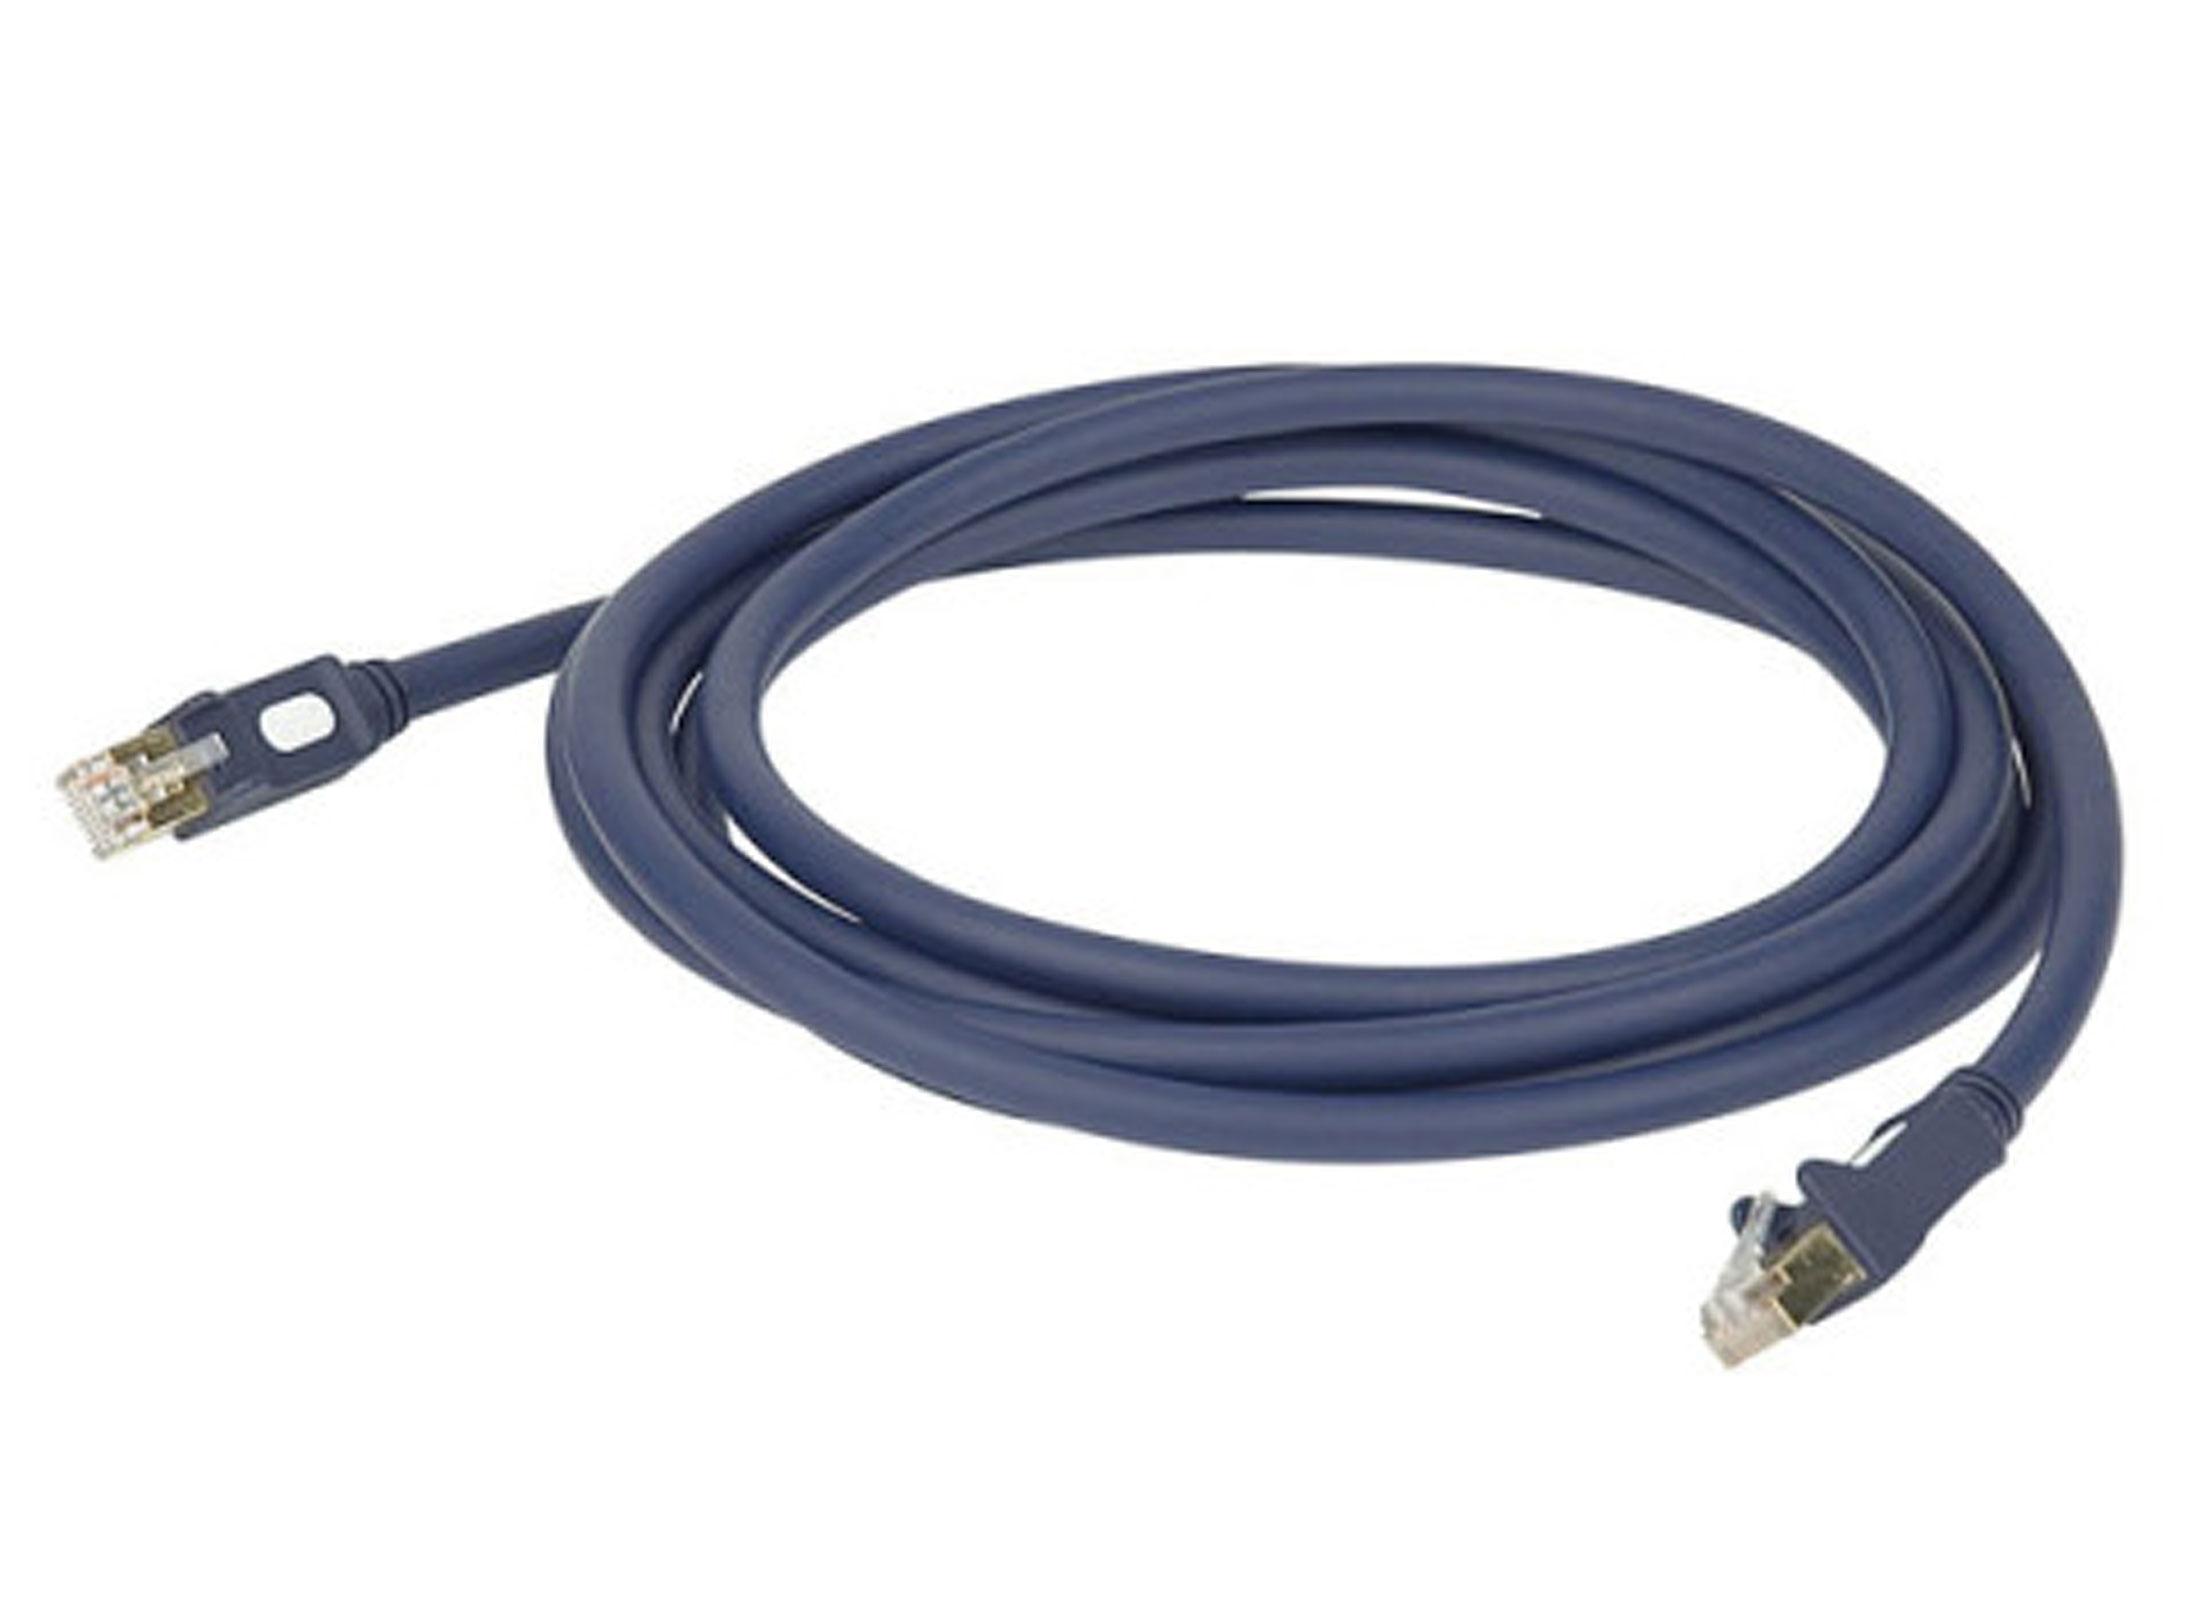 Dap Audio Fl553 Cat5 Power Cord Blue 3m Online At Low Prices Huss 1